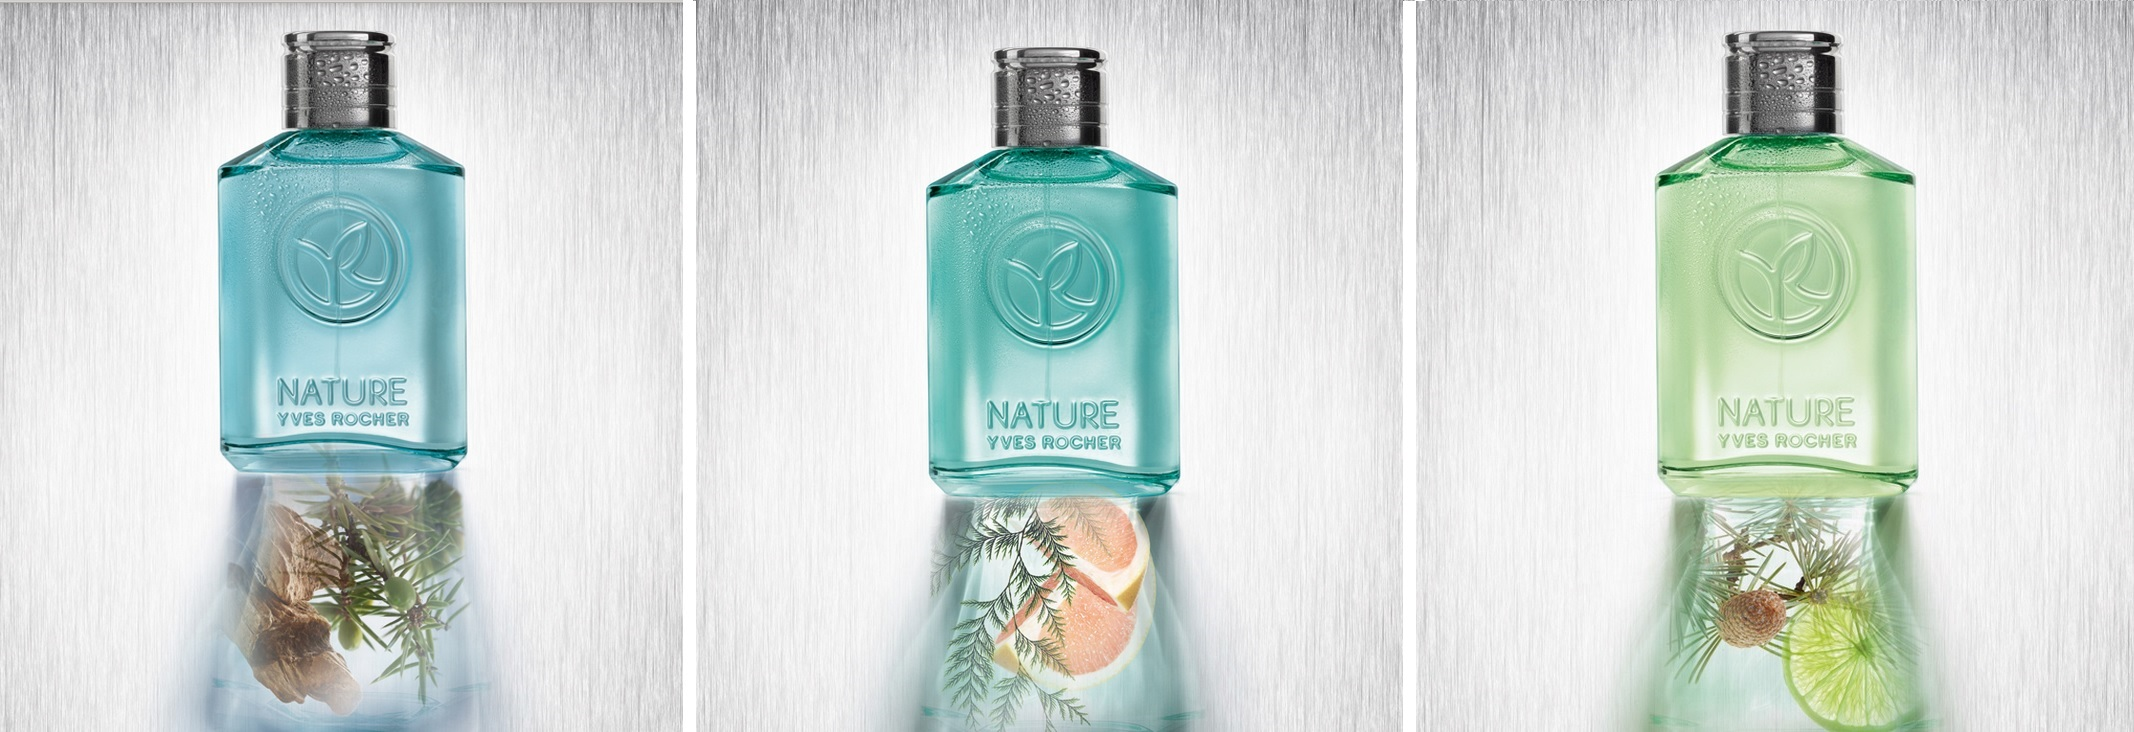 Nature Dyves Rocher Nouveau Trio Masculin Parfumista